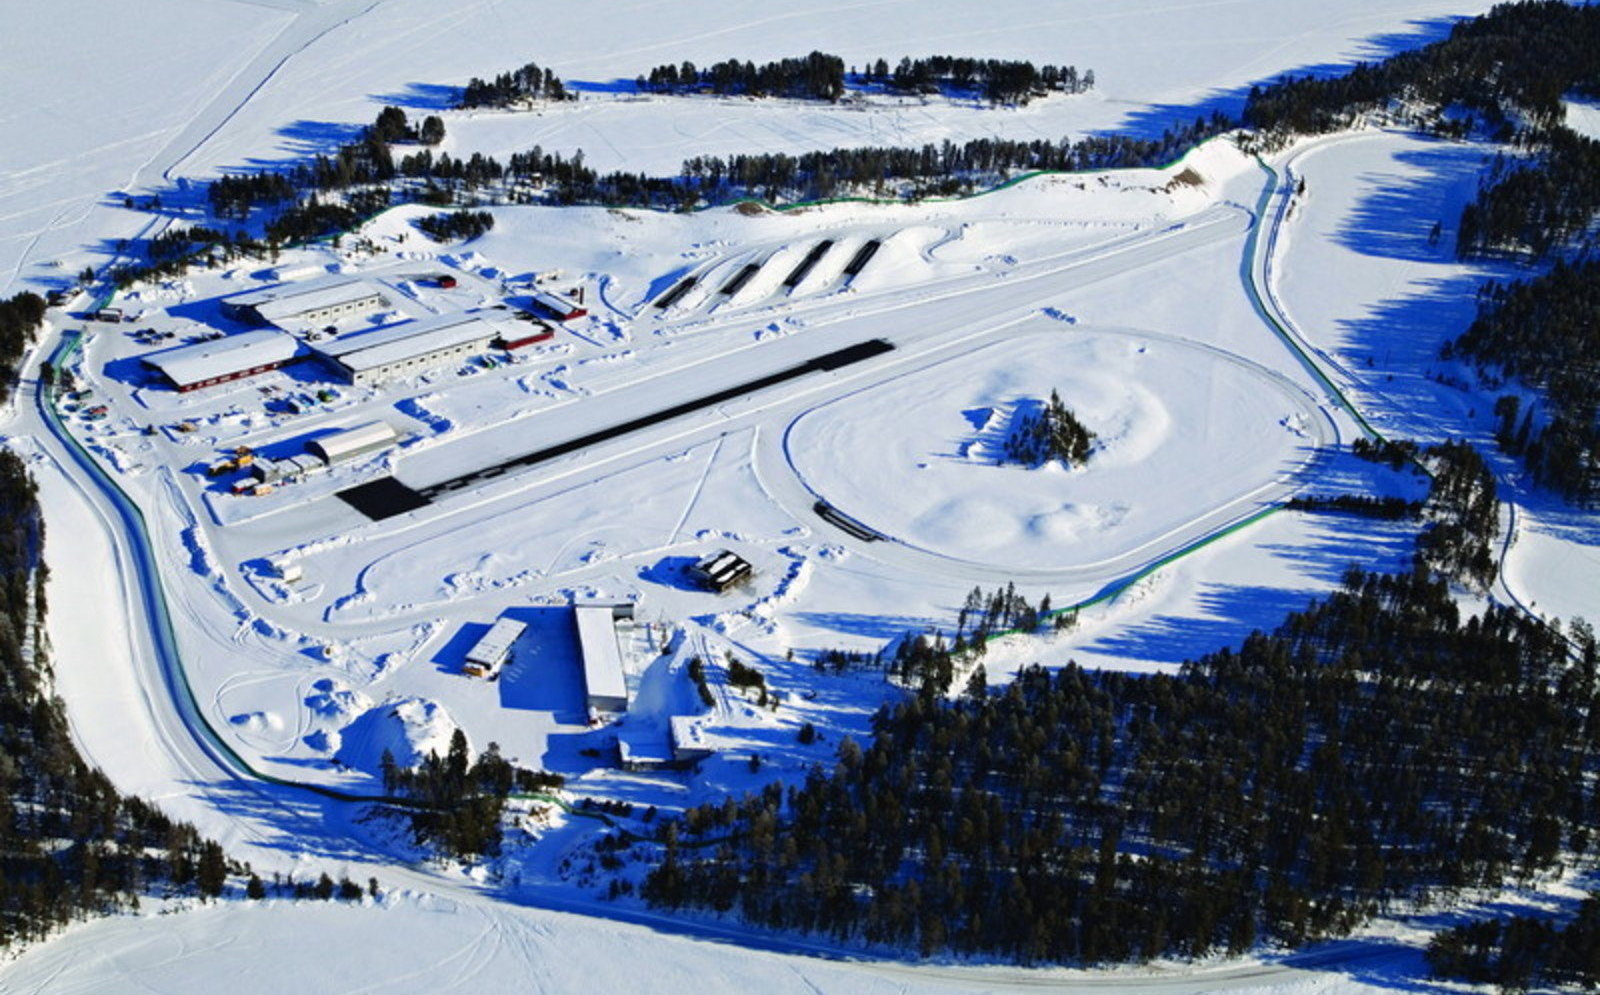 Sweden Arjeplog Bmw Test Track Small